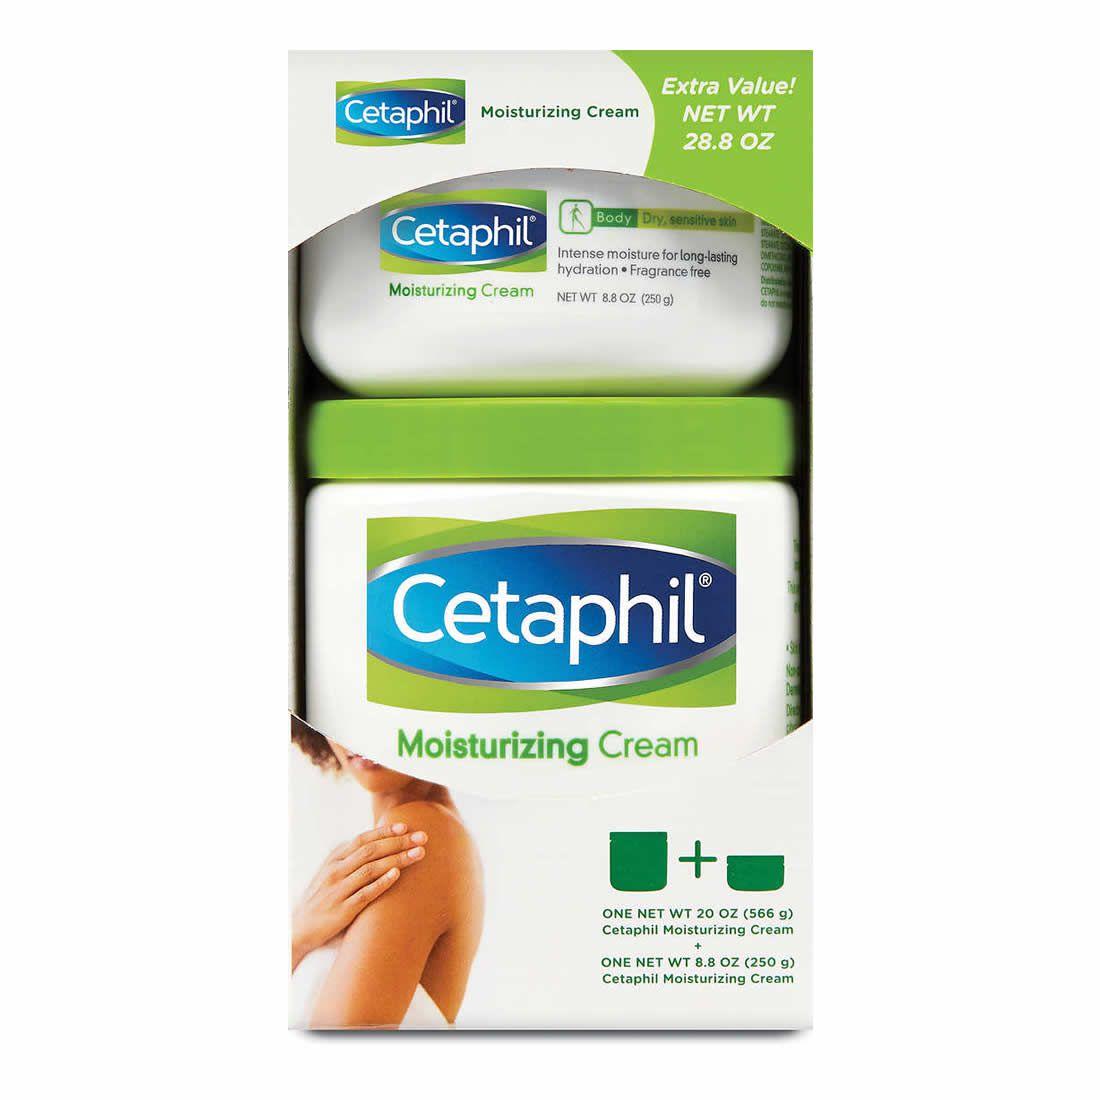 Creme Hidratante Cetaphil 566g + 250g embalagem econômica - Kit 2 Potes